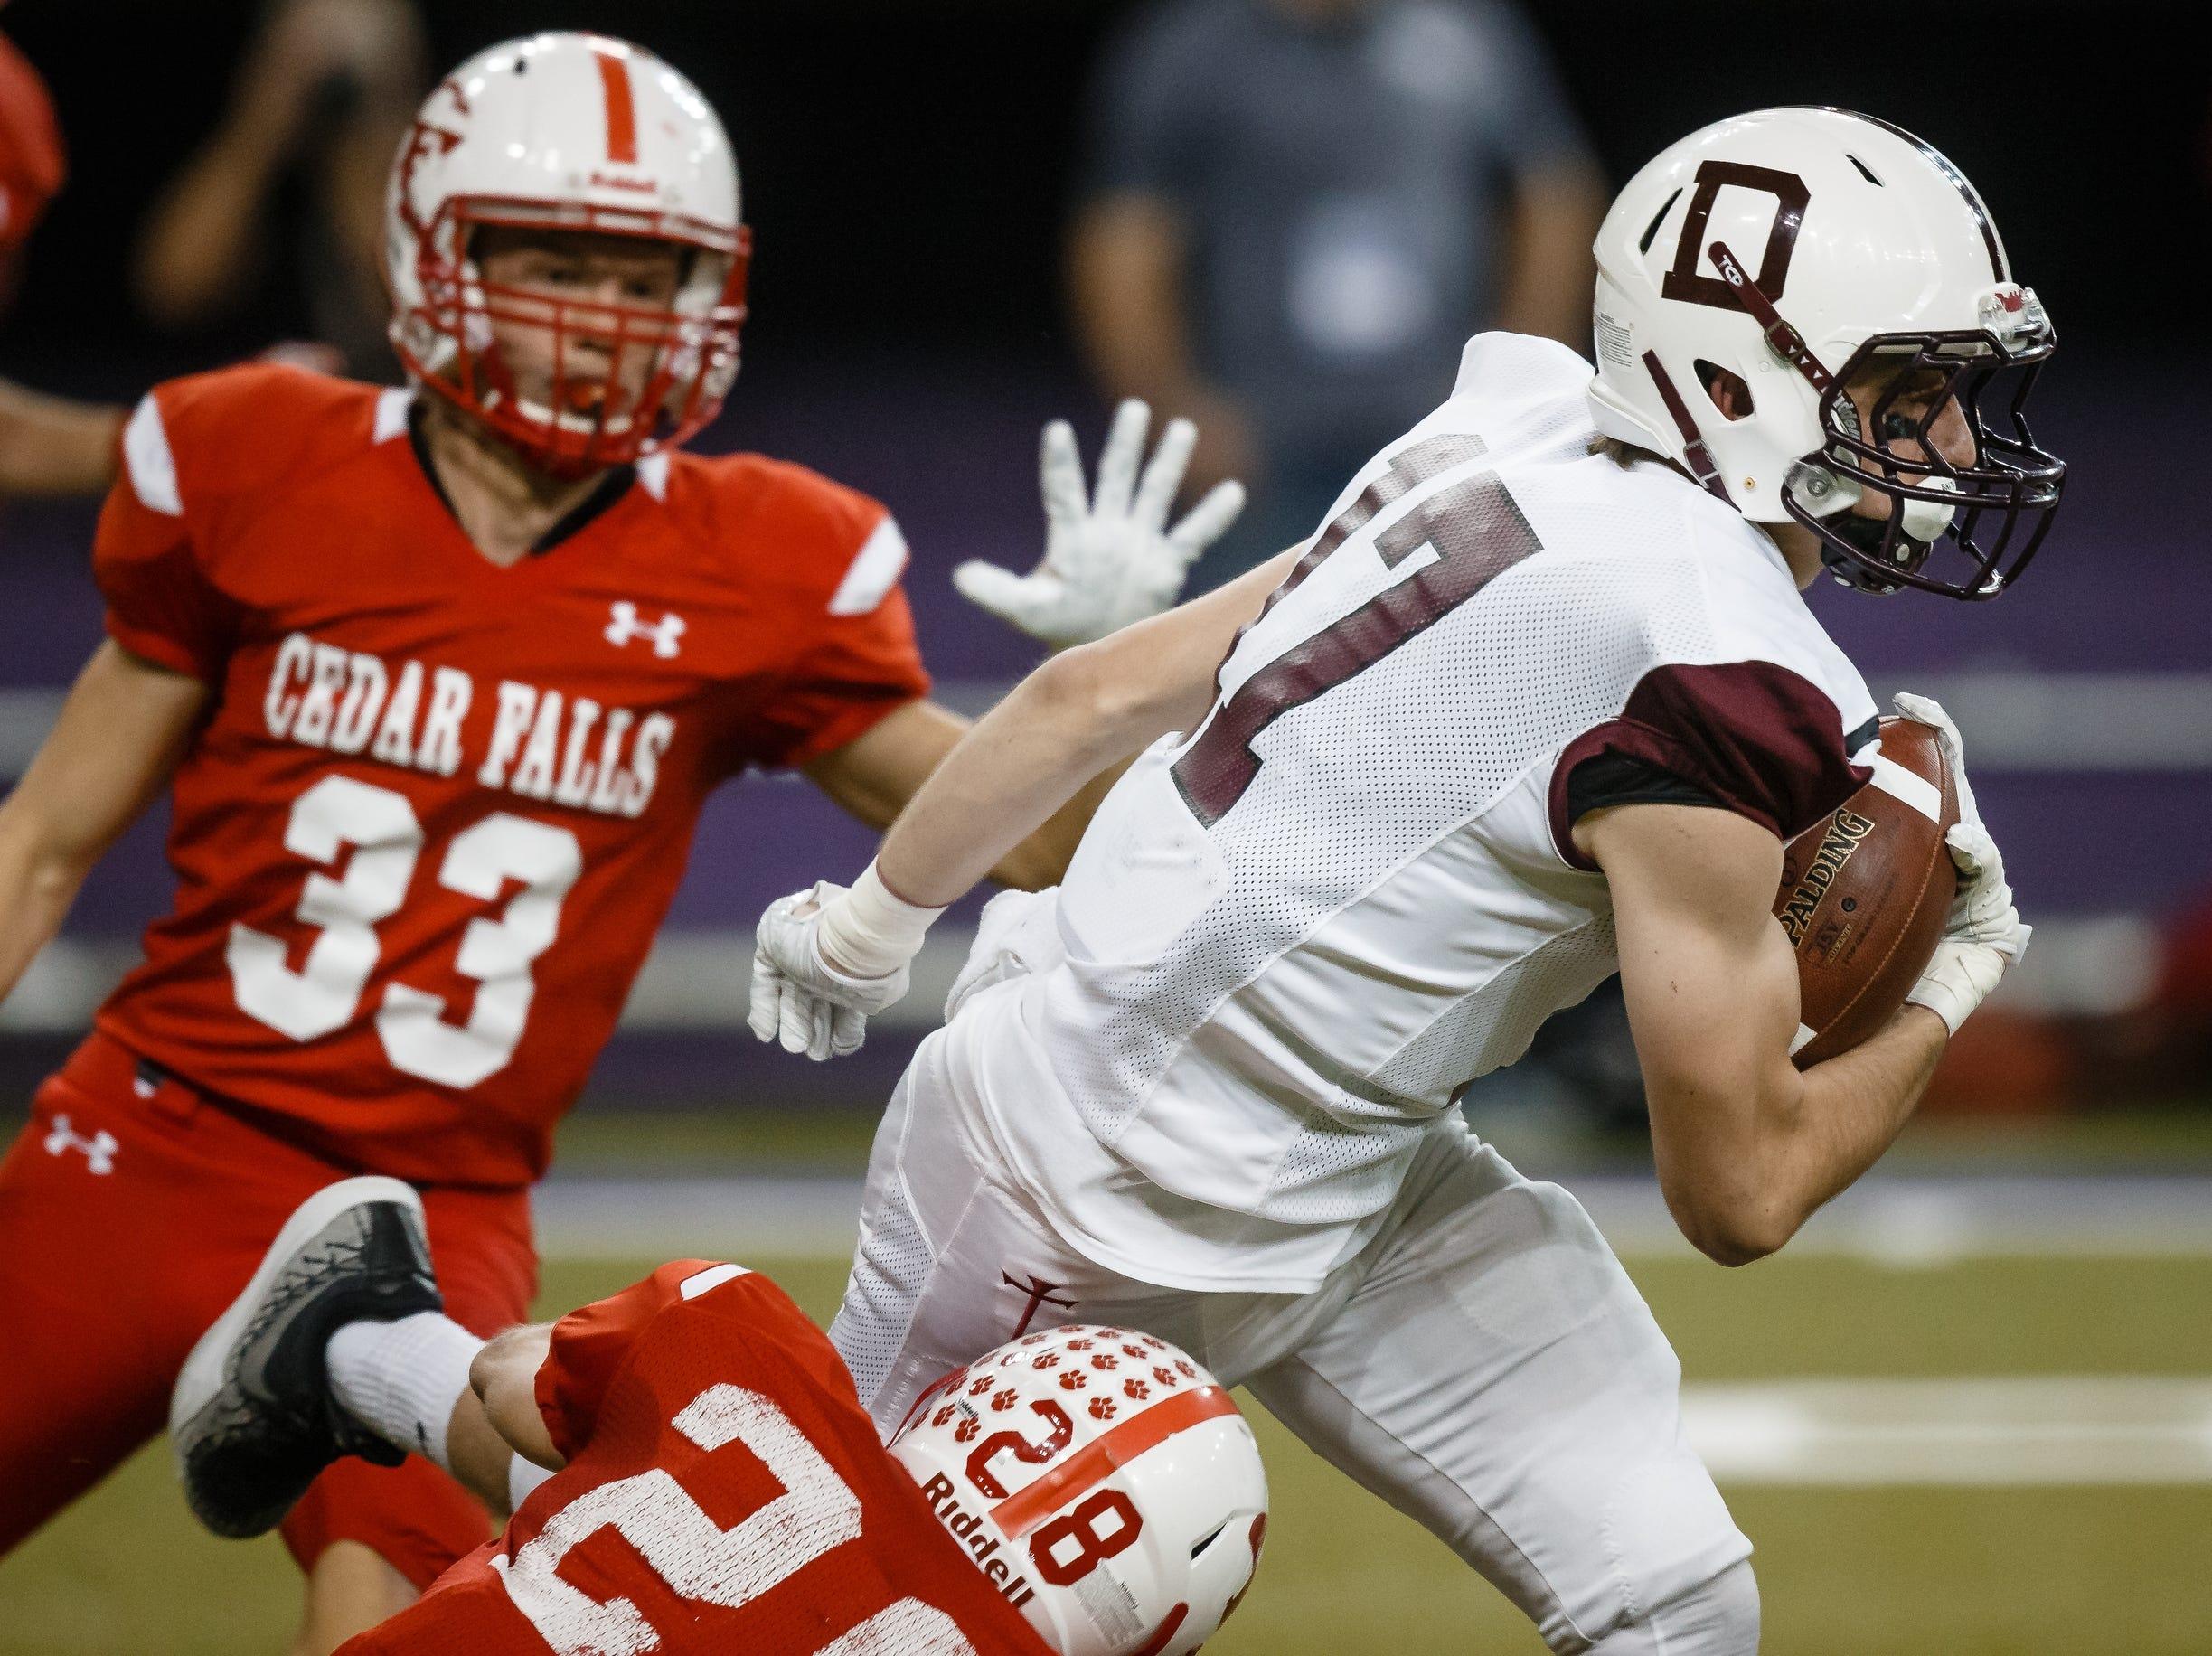 Dowling Catholic's Matt Stilwill (17) runs the ball during their class 4A state championship football game on Friday, Nov. 16, 2018, in Cedar Falls. Cedar Falls takes a 13-7 lead into halftime.